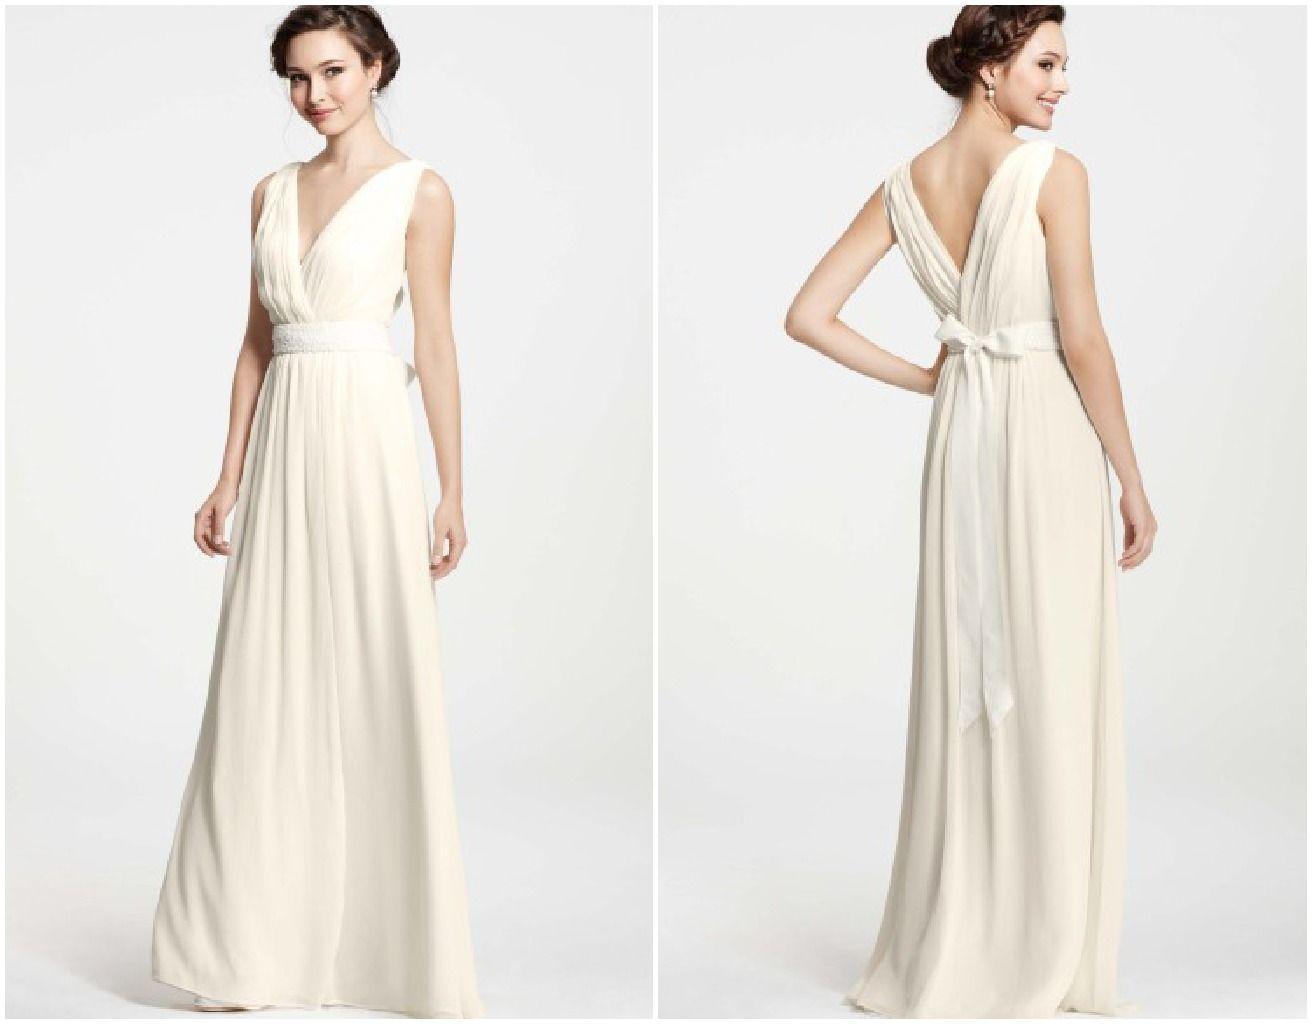 Ann taylor wedding dresses rustic wedding chic rustic country